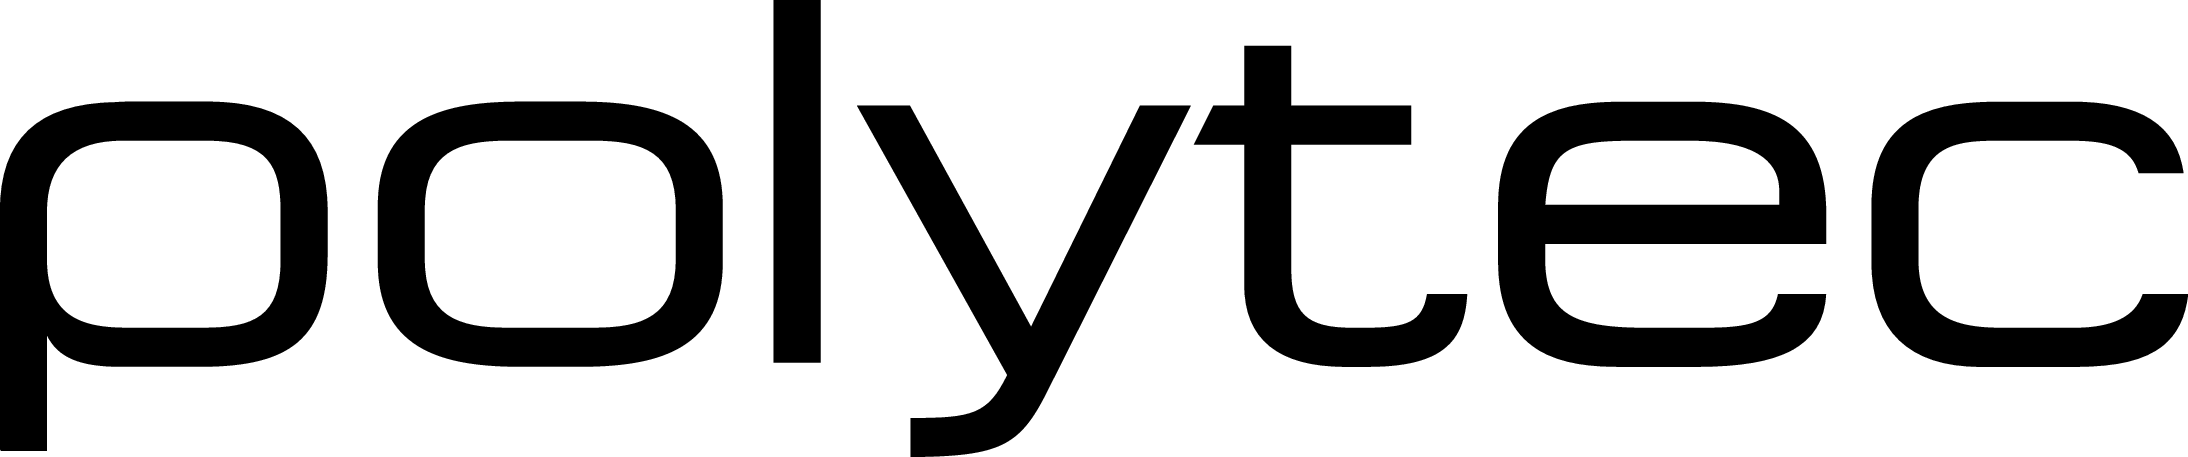 Polytec_Logo_Black.eps.png